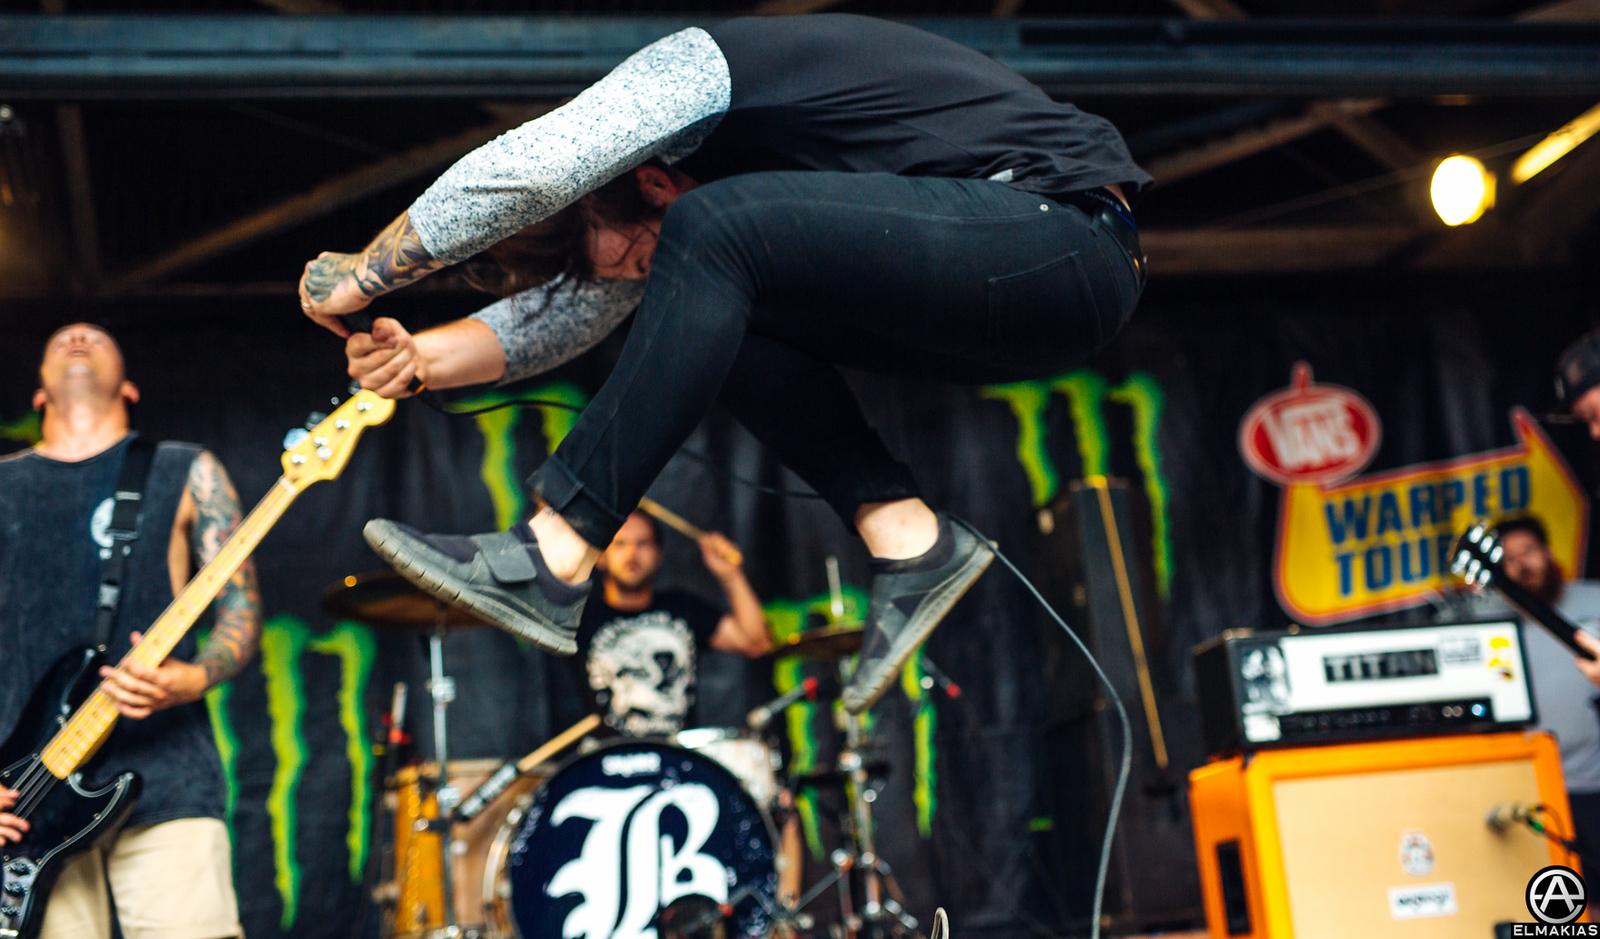 Caleb Shomo of Beartooth live at Vans Warped Tour 2015 by Adam Elmakias